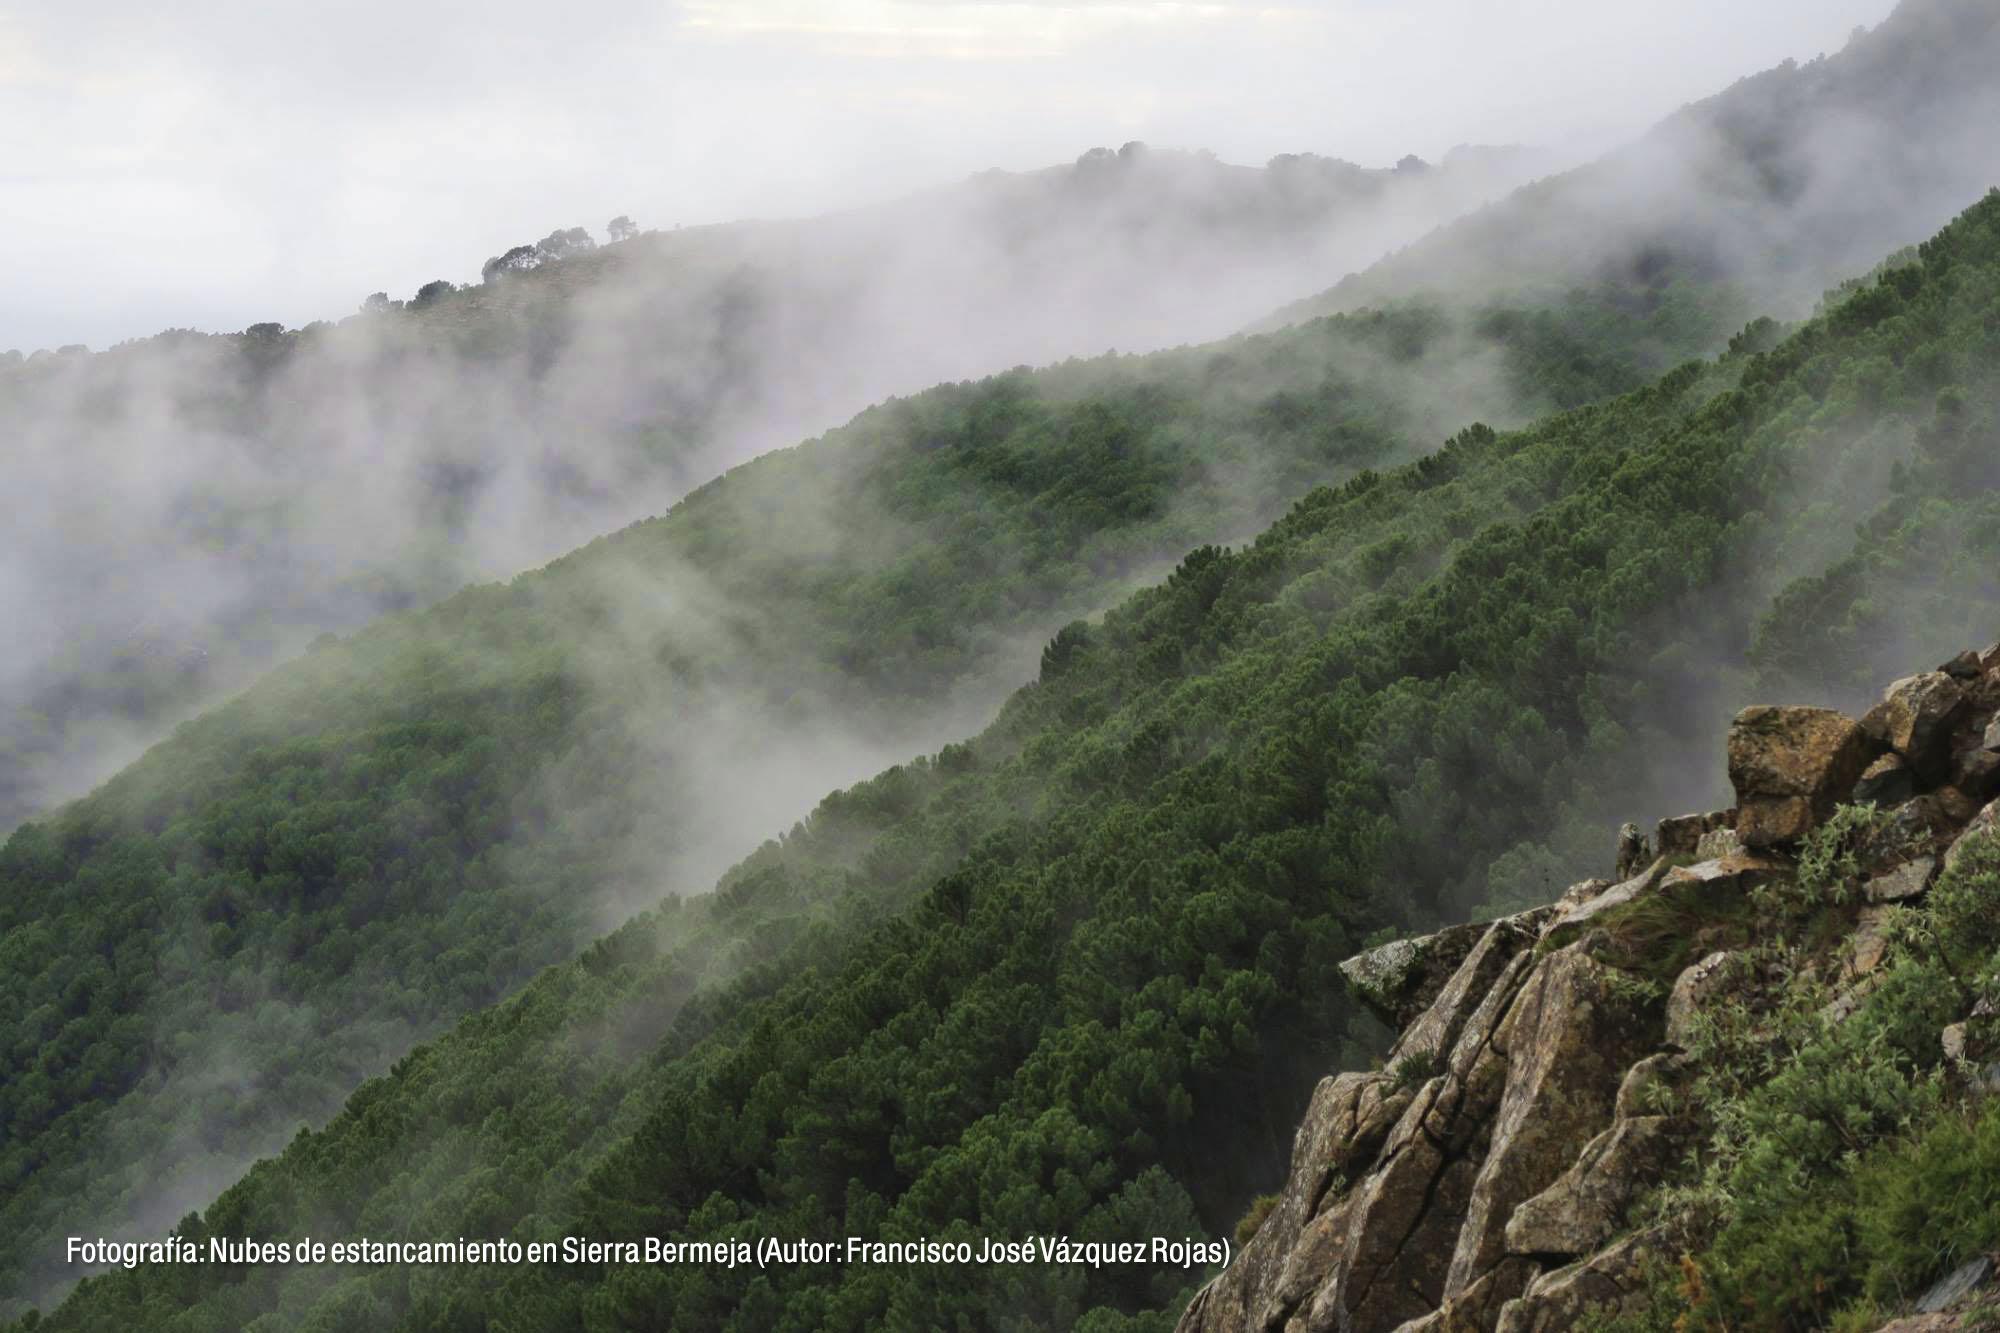 Nubes de estancamiento en Sierra Bermeja